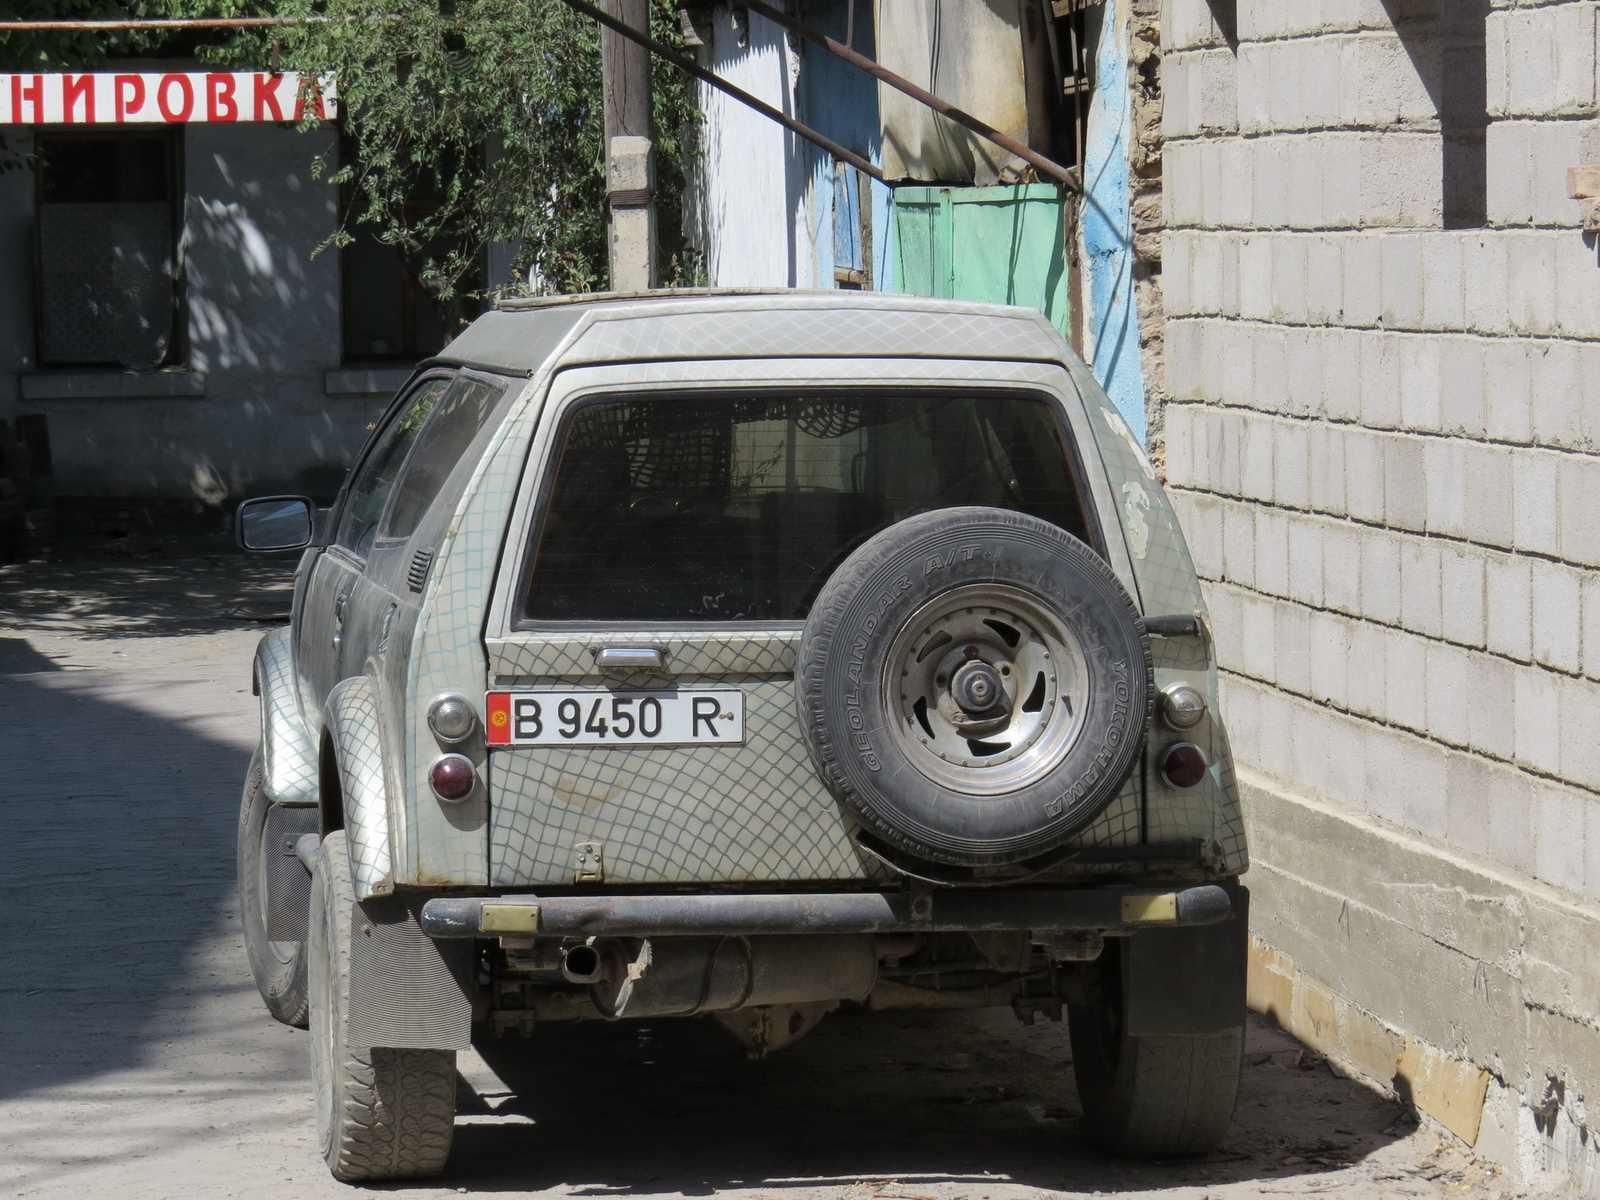 2002. САМАВТО. Кыргызстан. Автор неизвестен. Агрегатная база ГАЗ-69